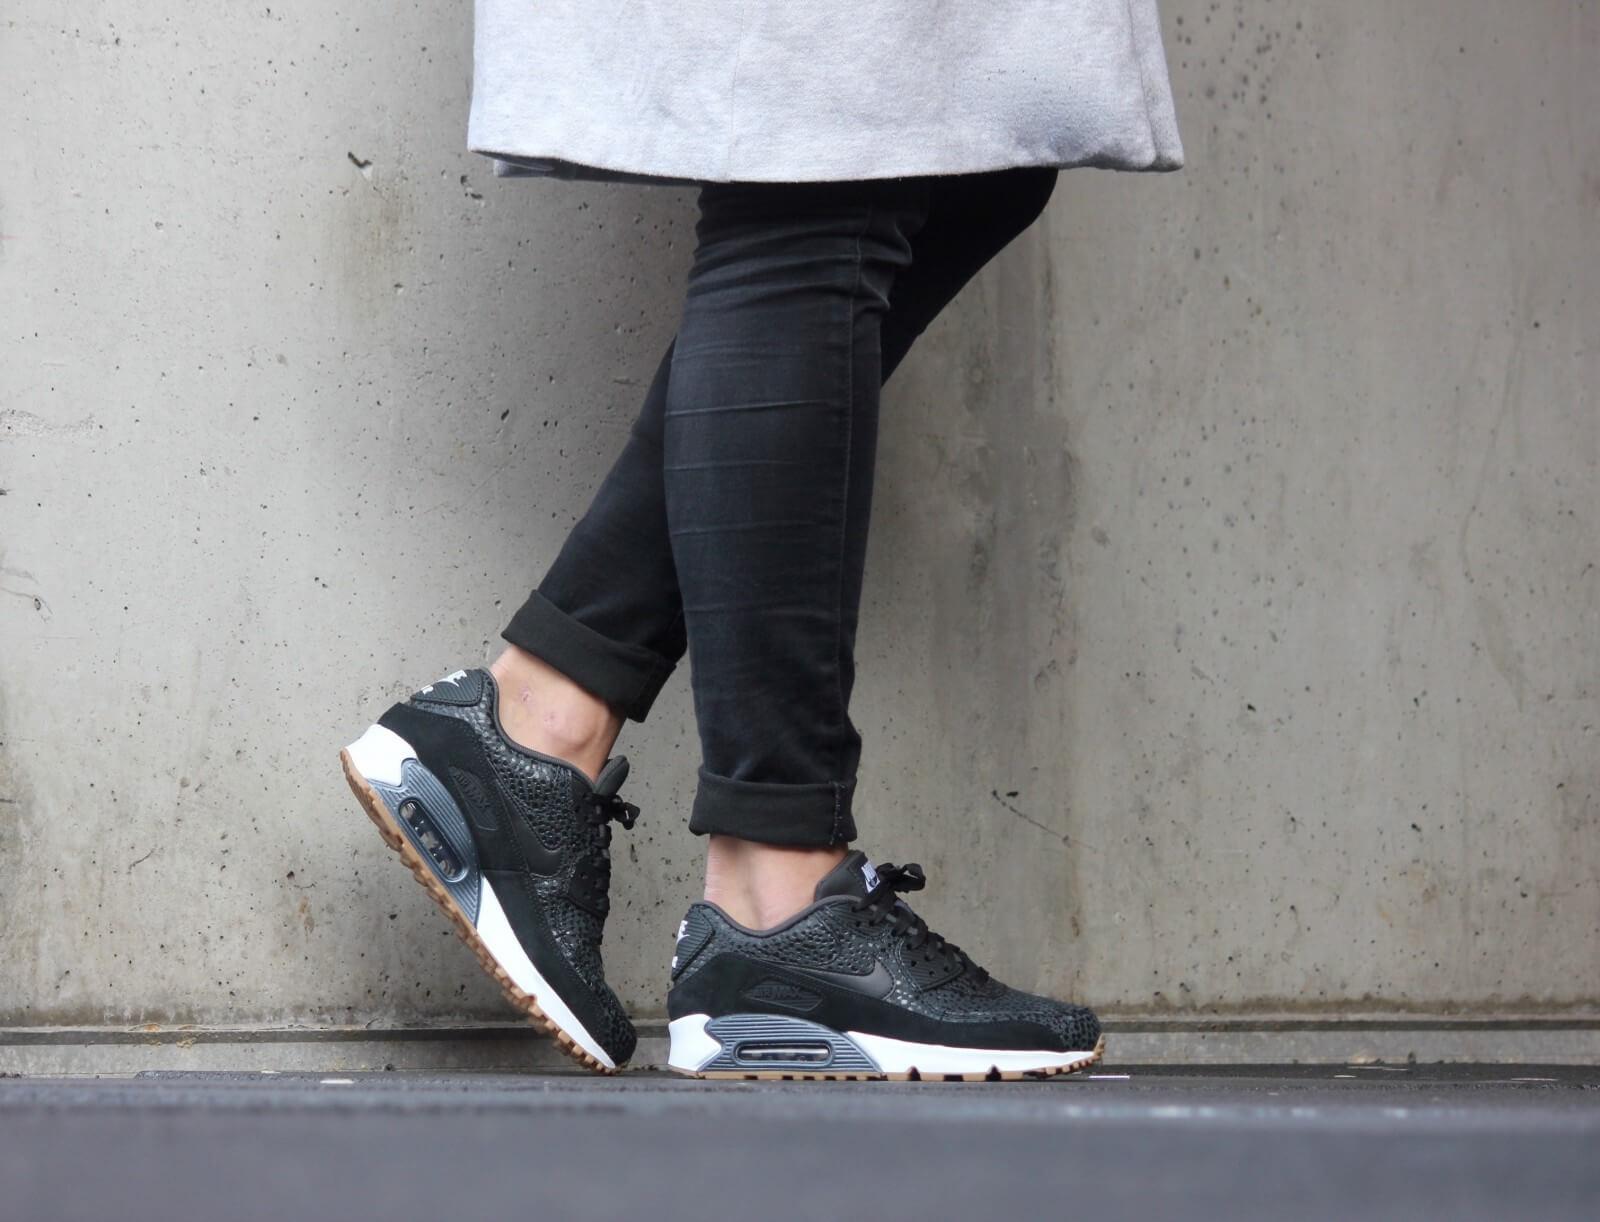 Nike WMNS Air Max 90 PRM Safari BlackBlack White 443817 006